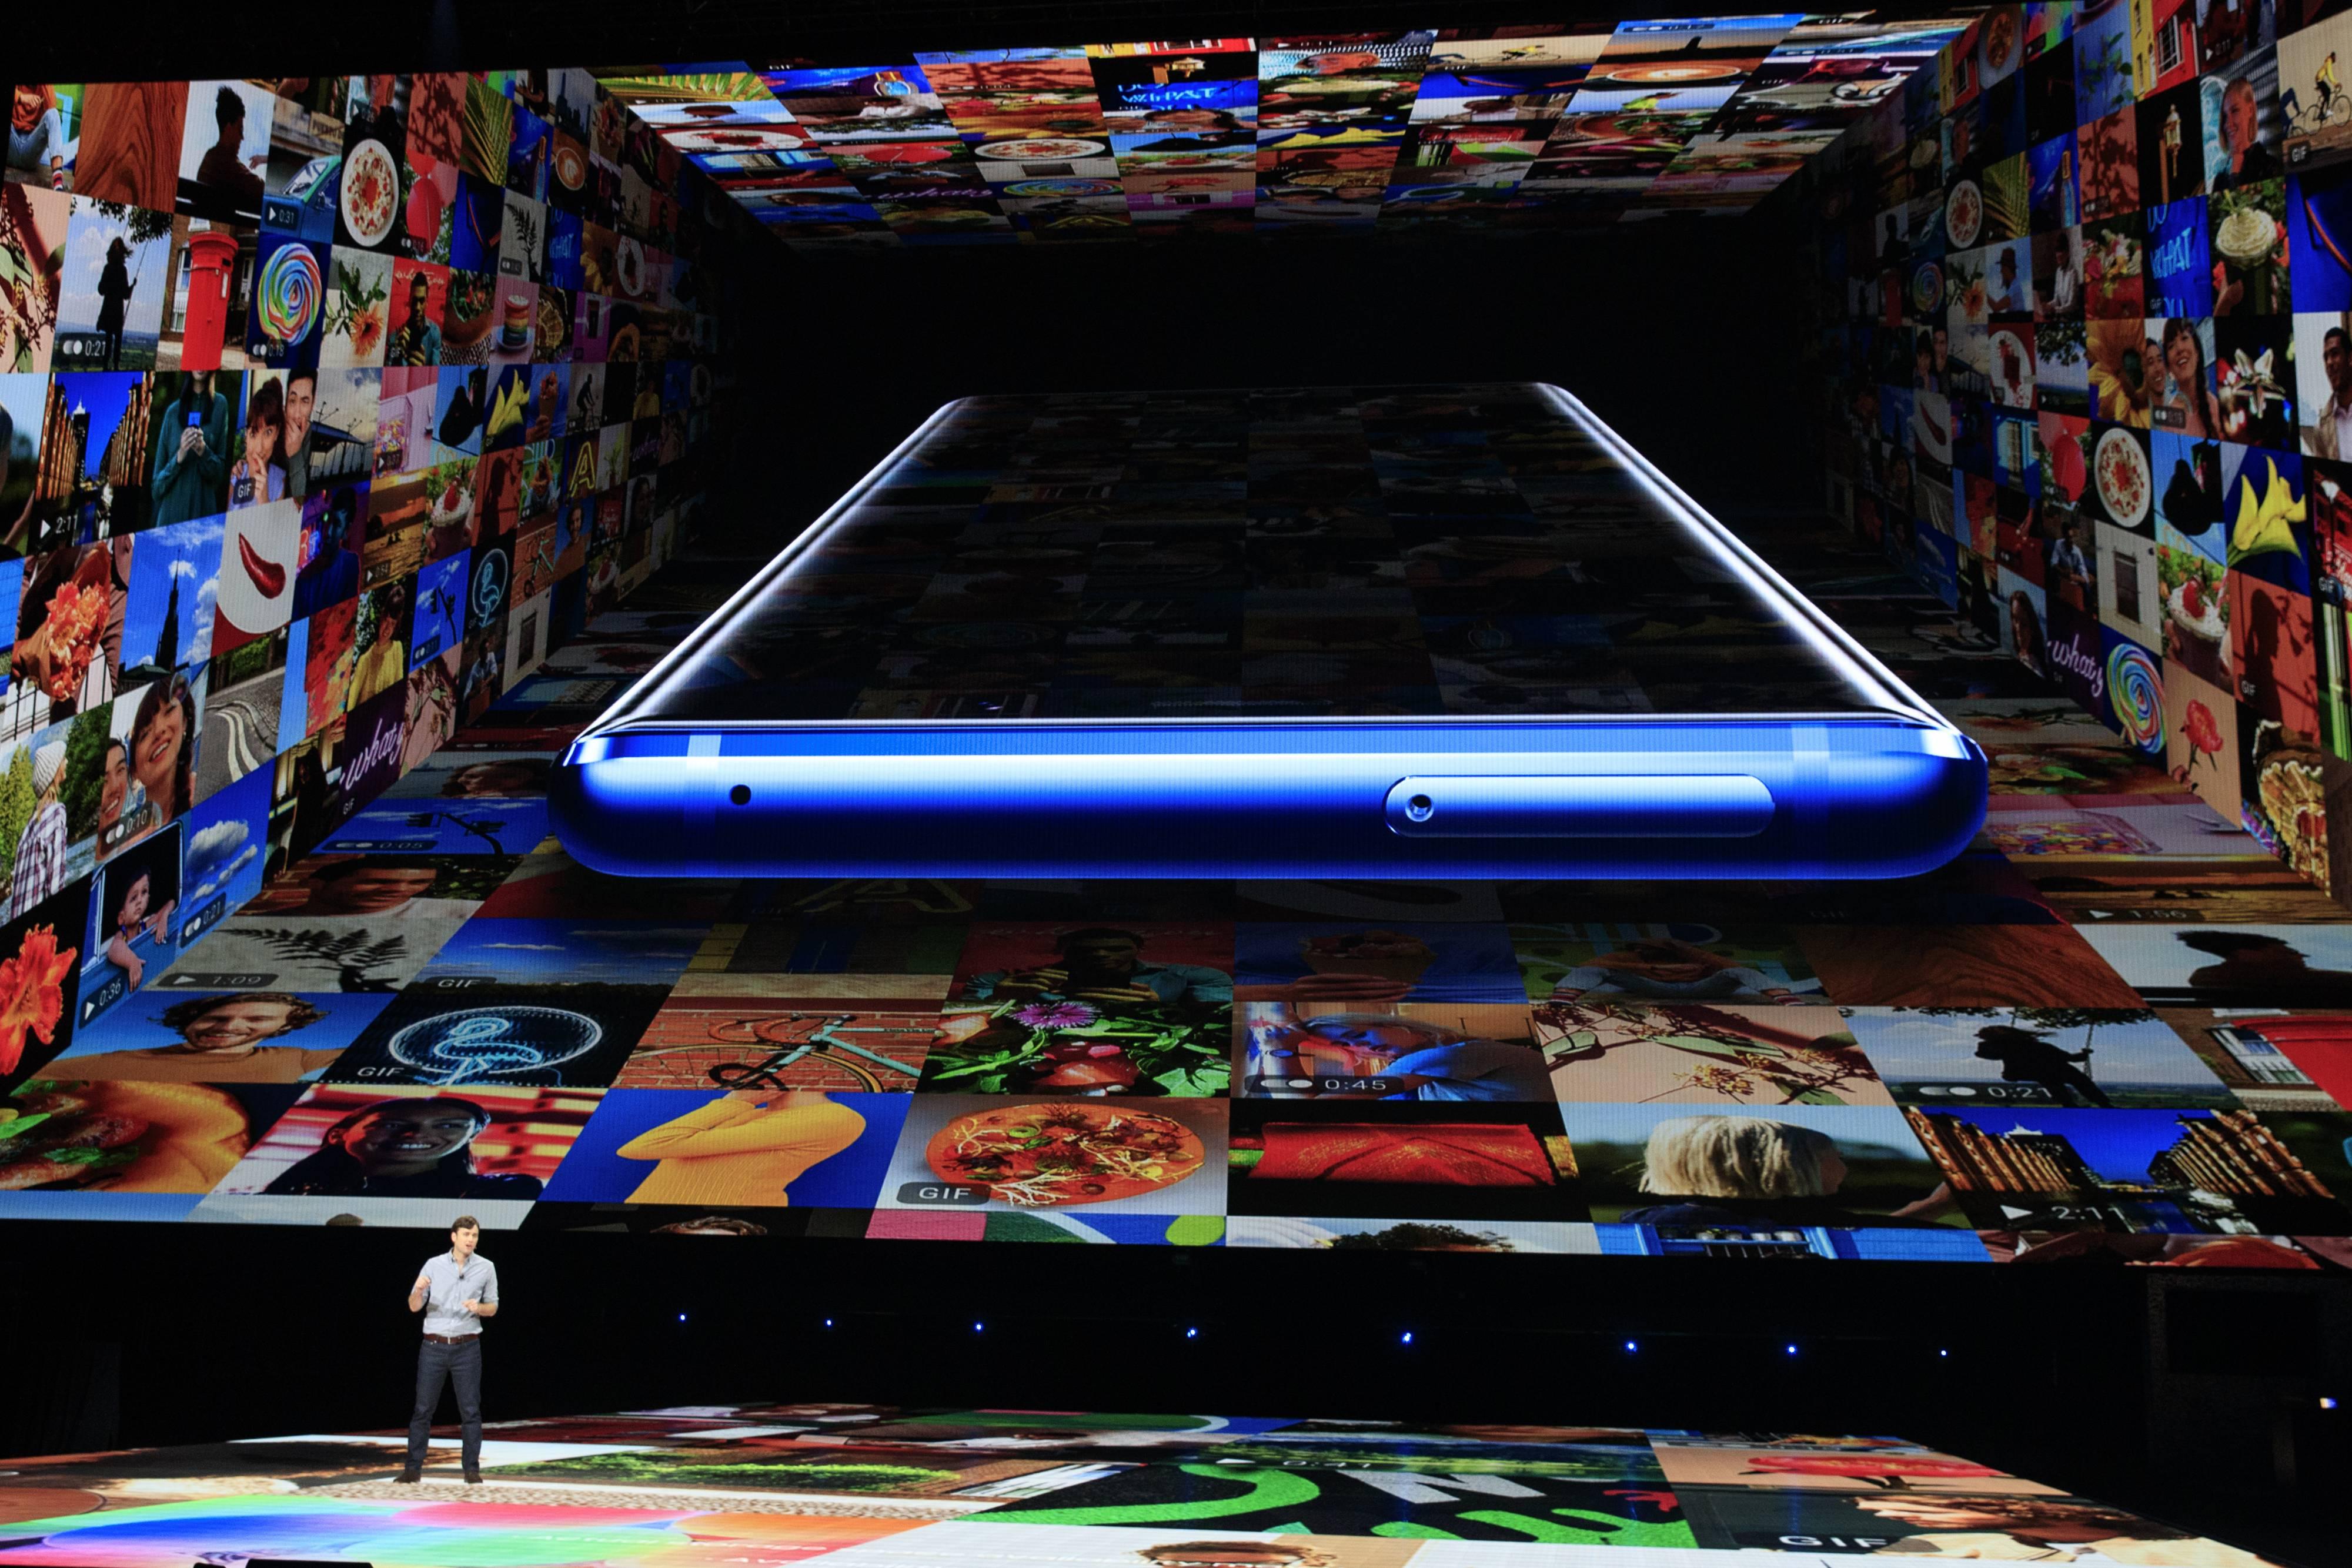 Samsung Unveils New Galaxy Note Smart Phone